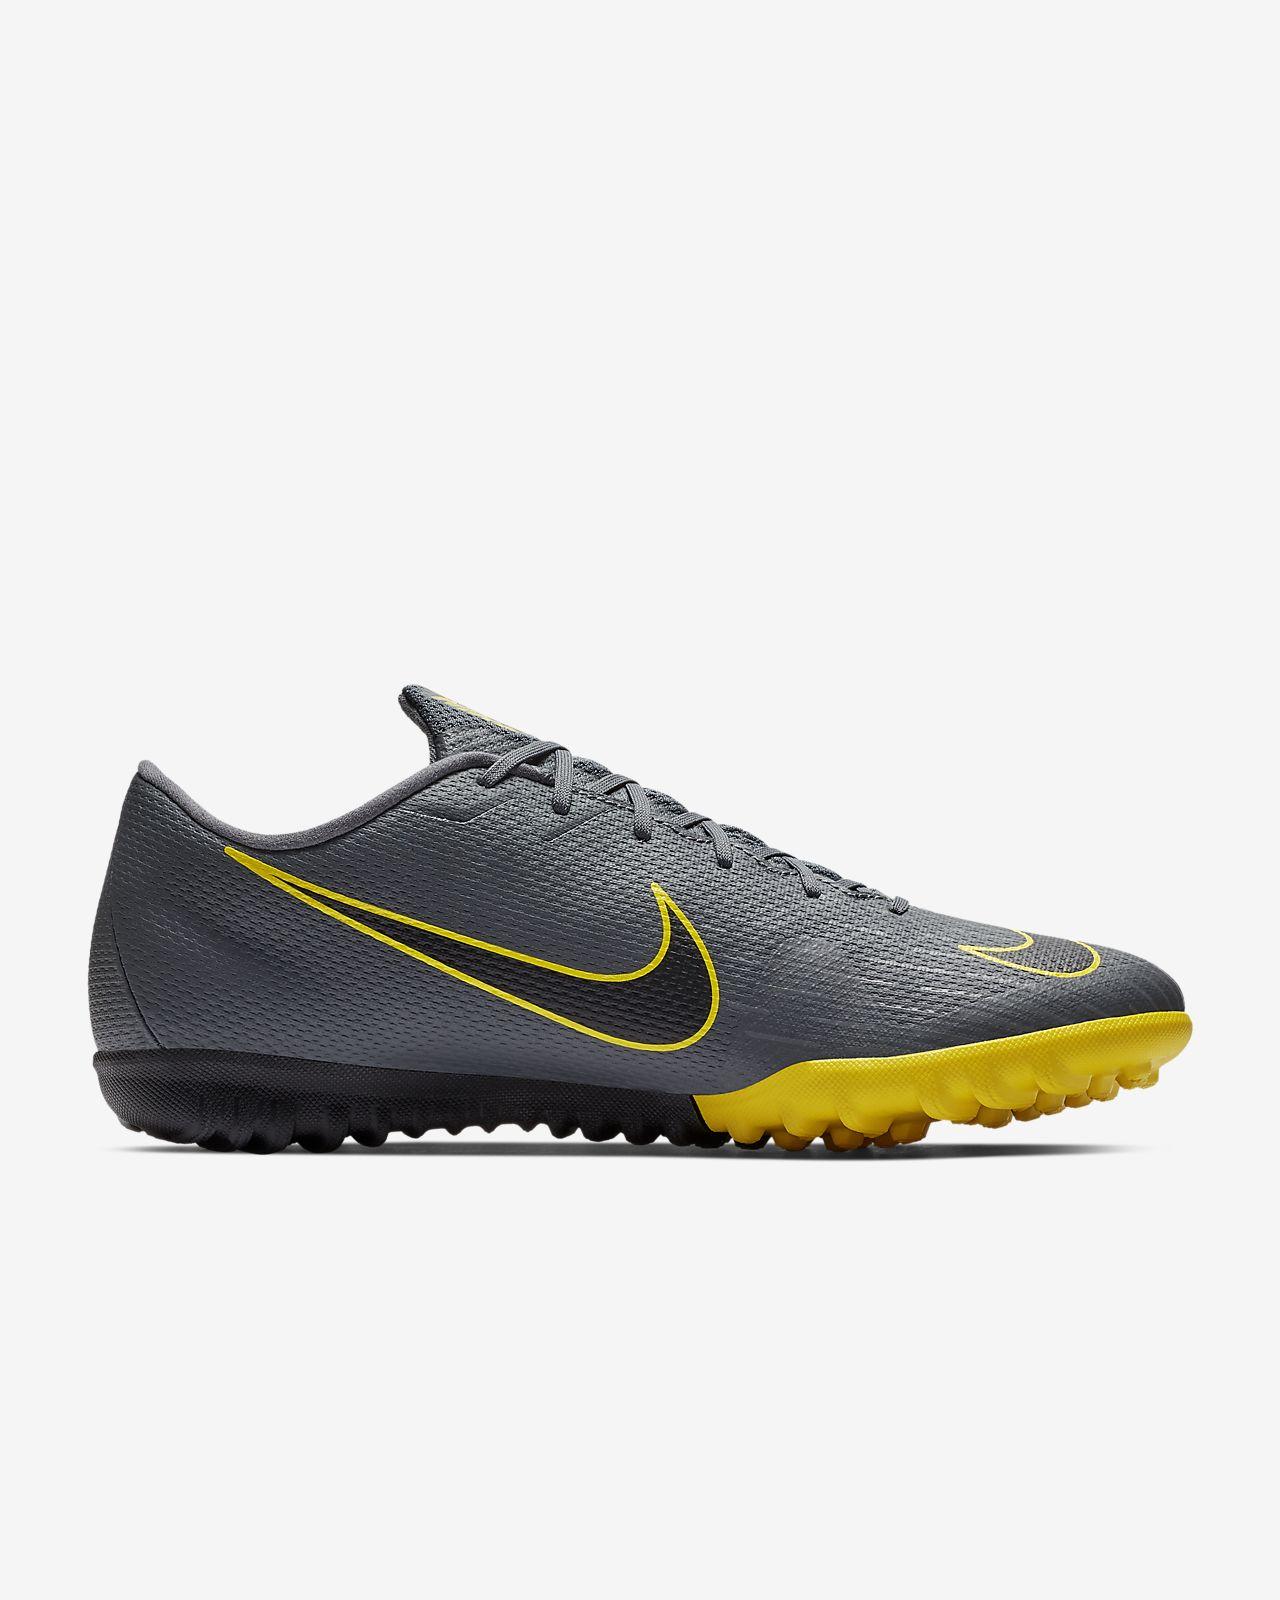 pretty nice 00563 1eed1 ... Nike VaporX 12 Academy TF Artificial-Turf Soccer Cleat